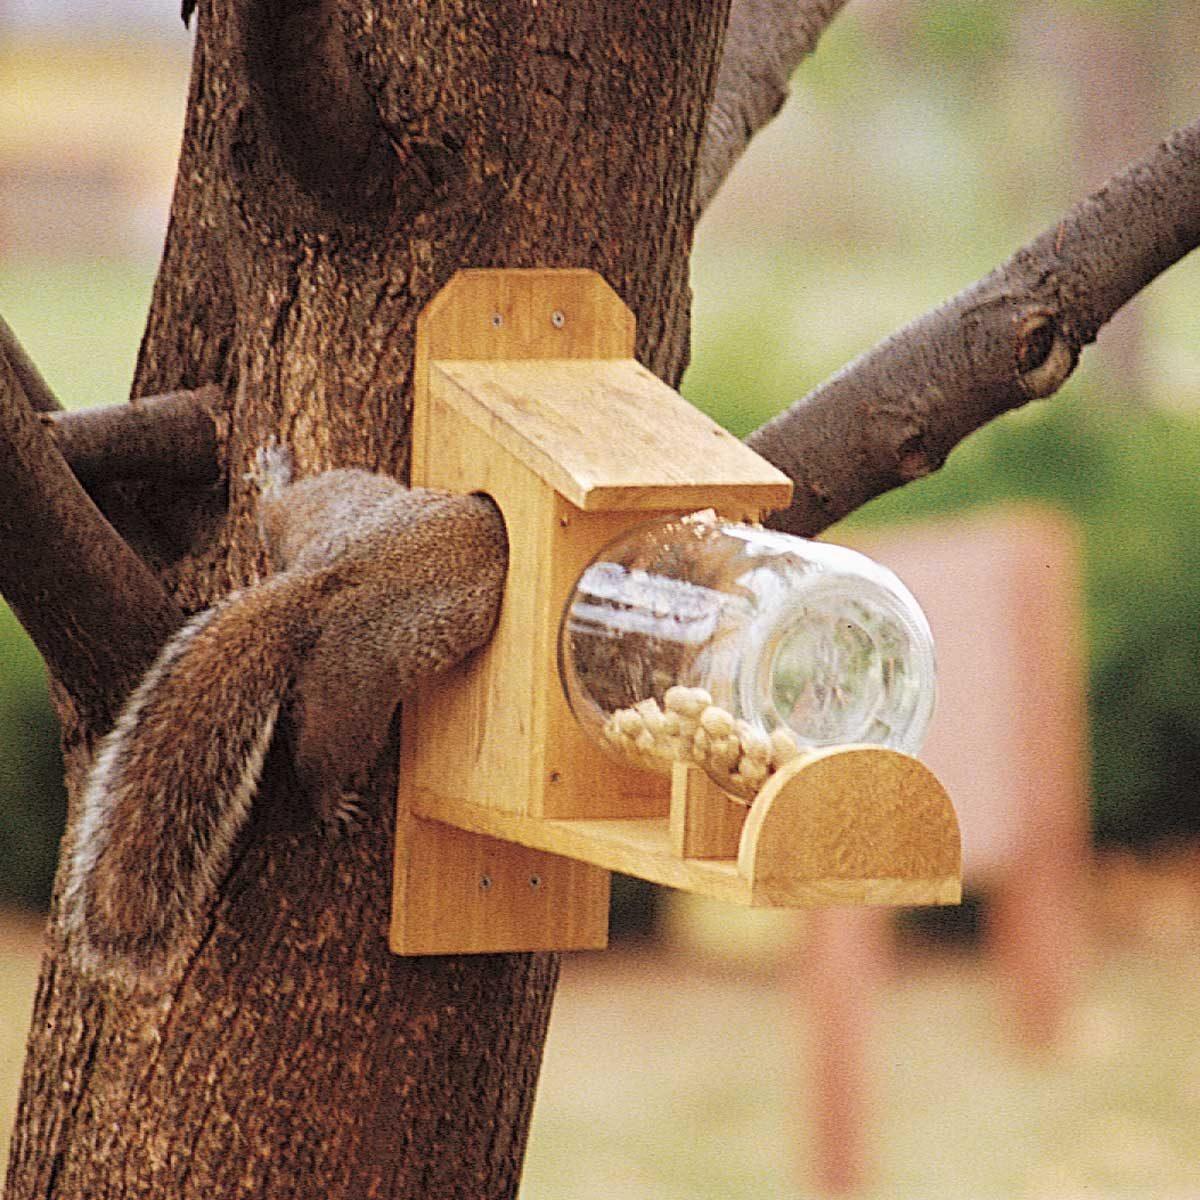 entertaining squirrel feeder half way